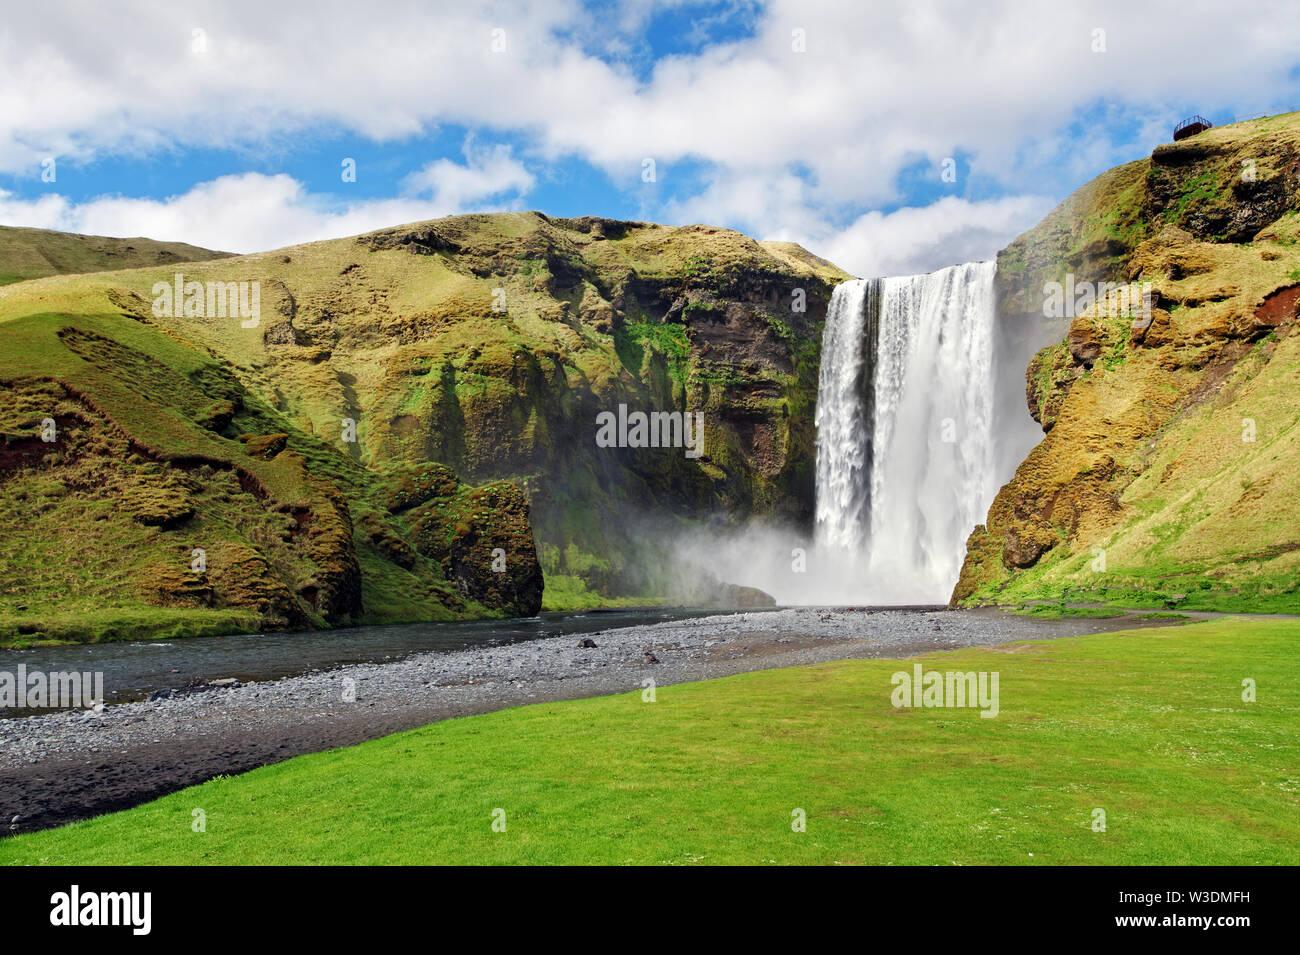 Iceland waterfall - Skogafoss Stock Photo